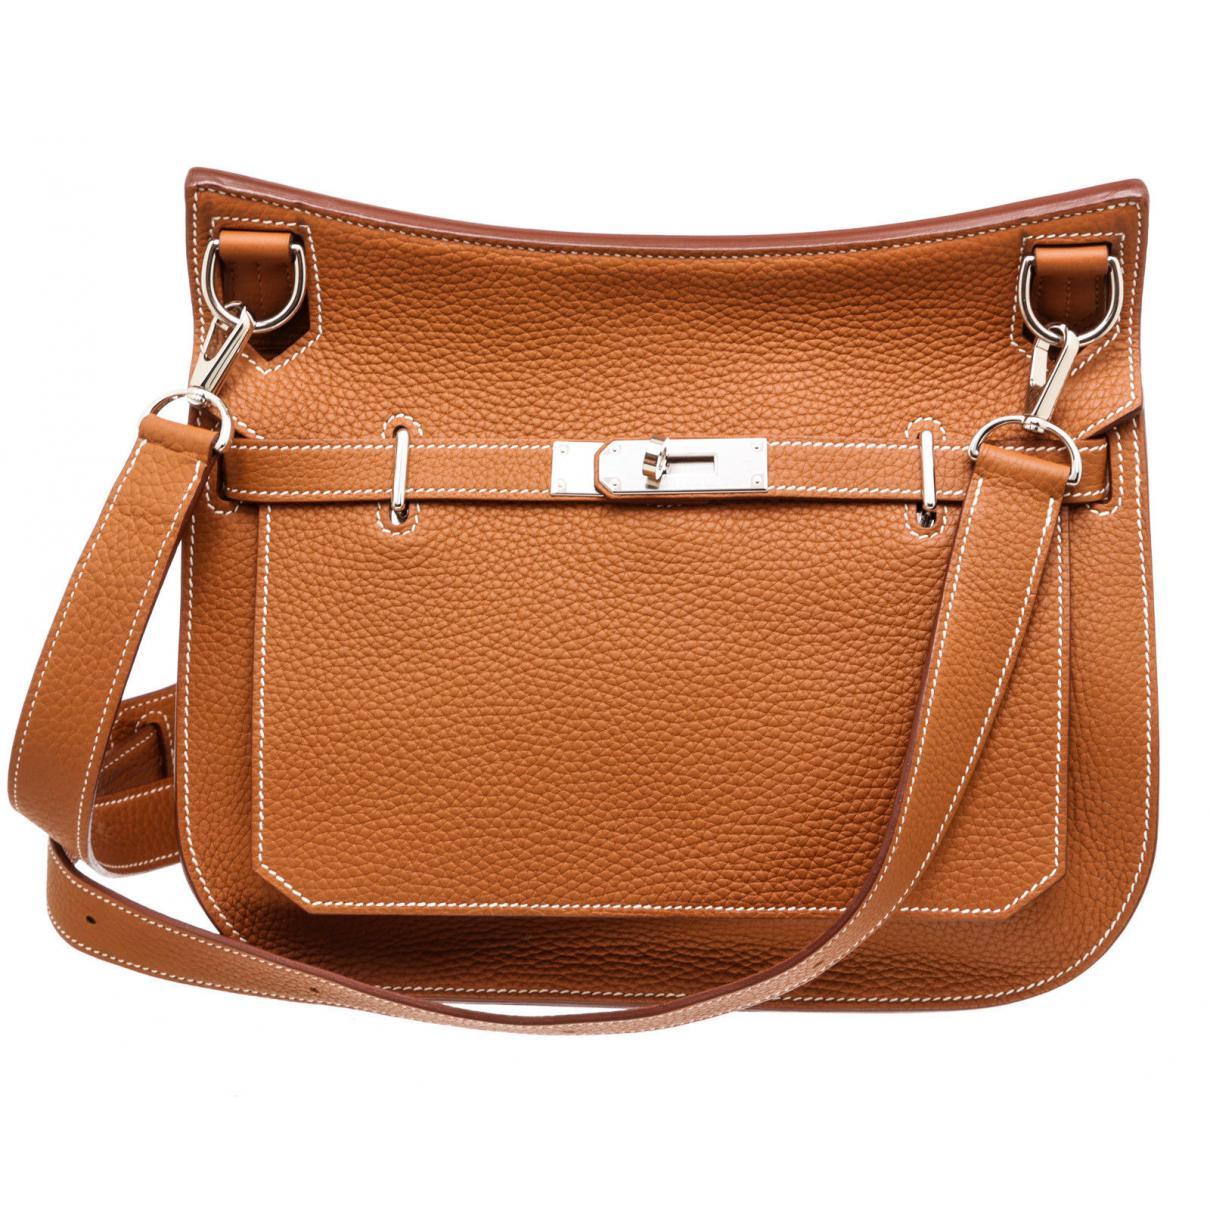 Hermès Pre-owned - Jypsiere leather crossbody bag yrqmdX